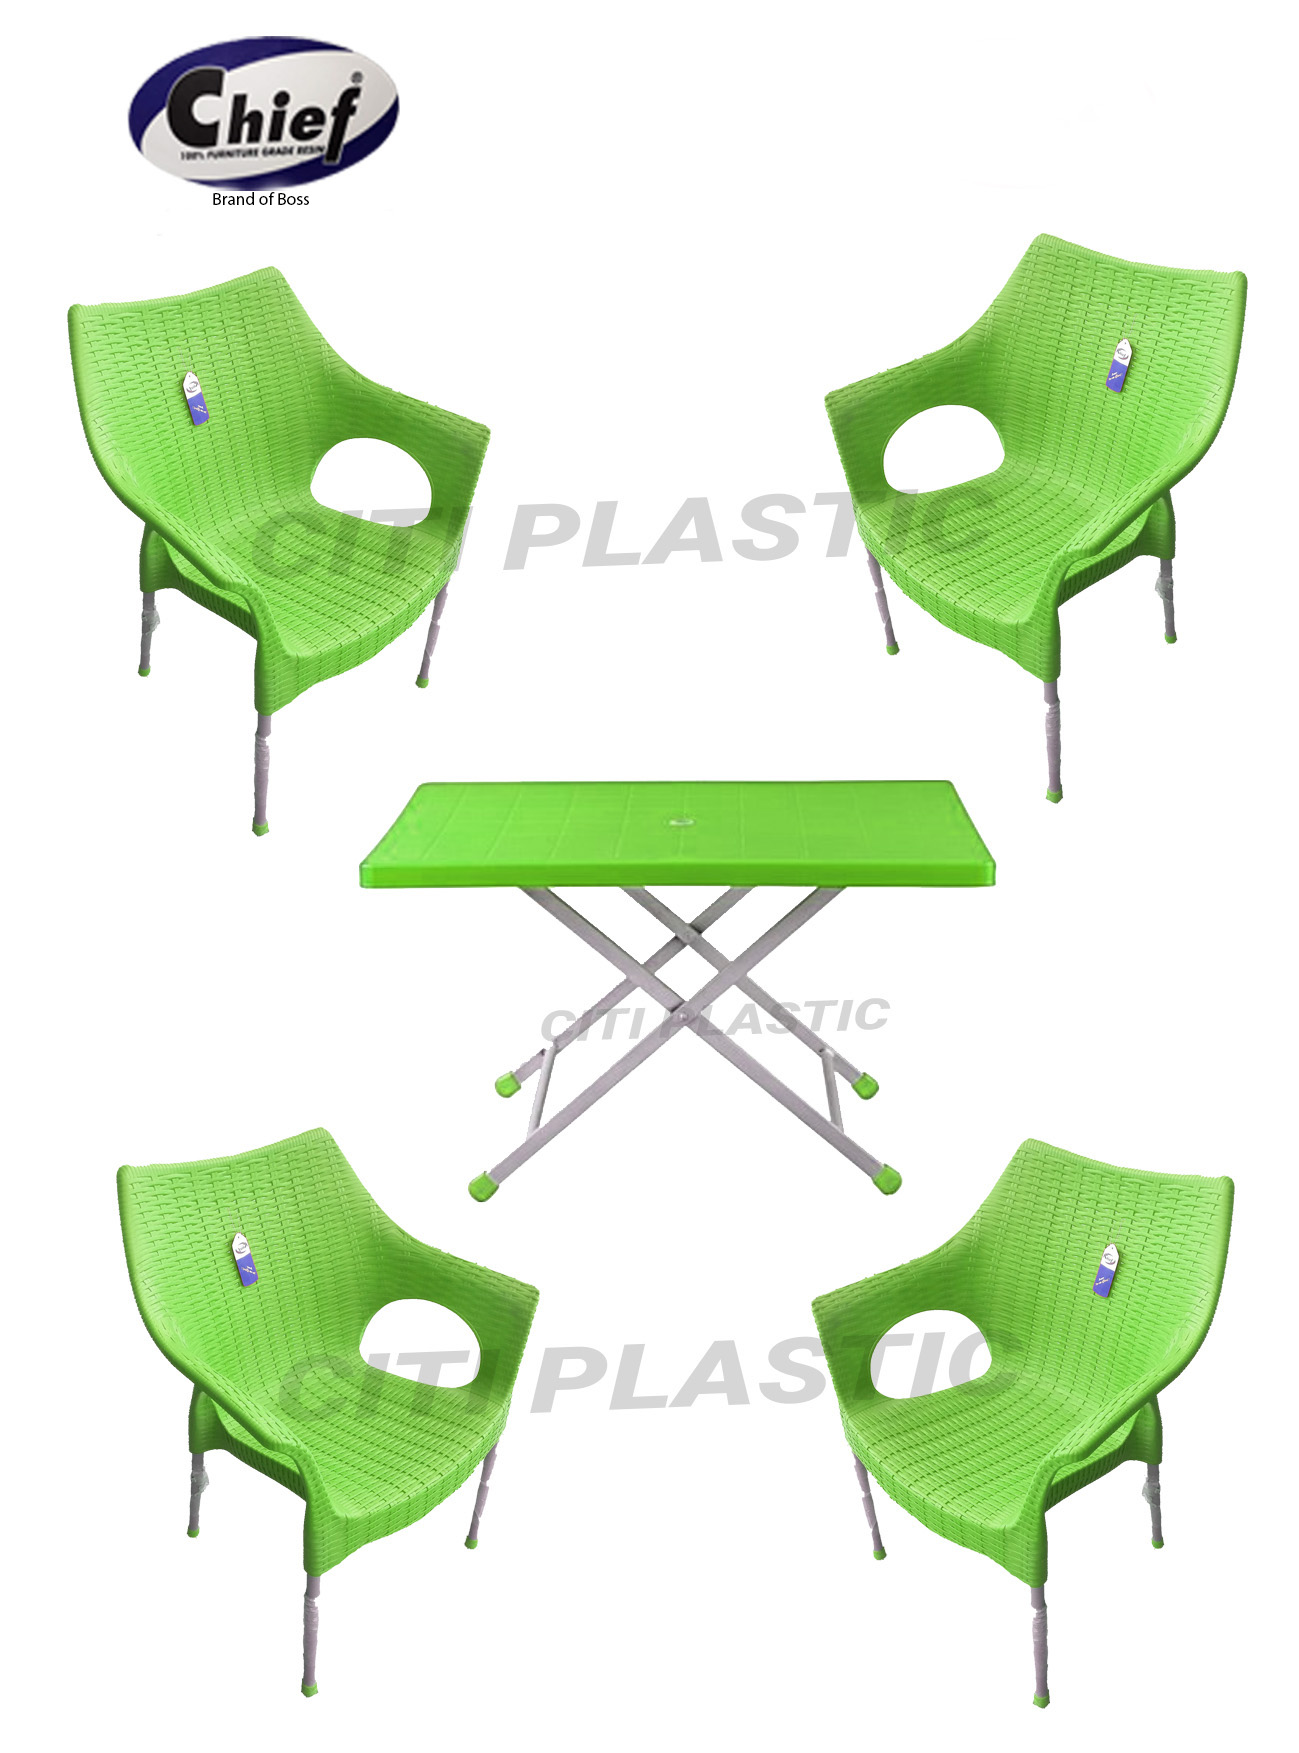 Chief Set Of 10 Rattan Plastic indoor/ outdoor Garden Chairs And Plastic  Table - Green